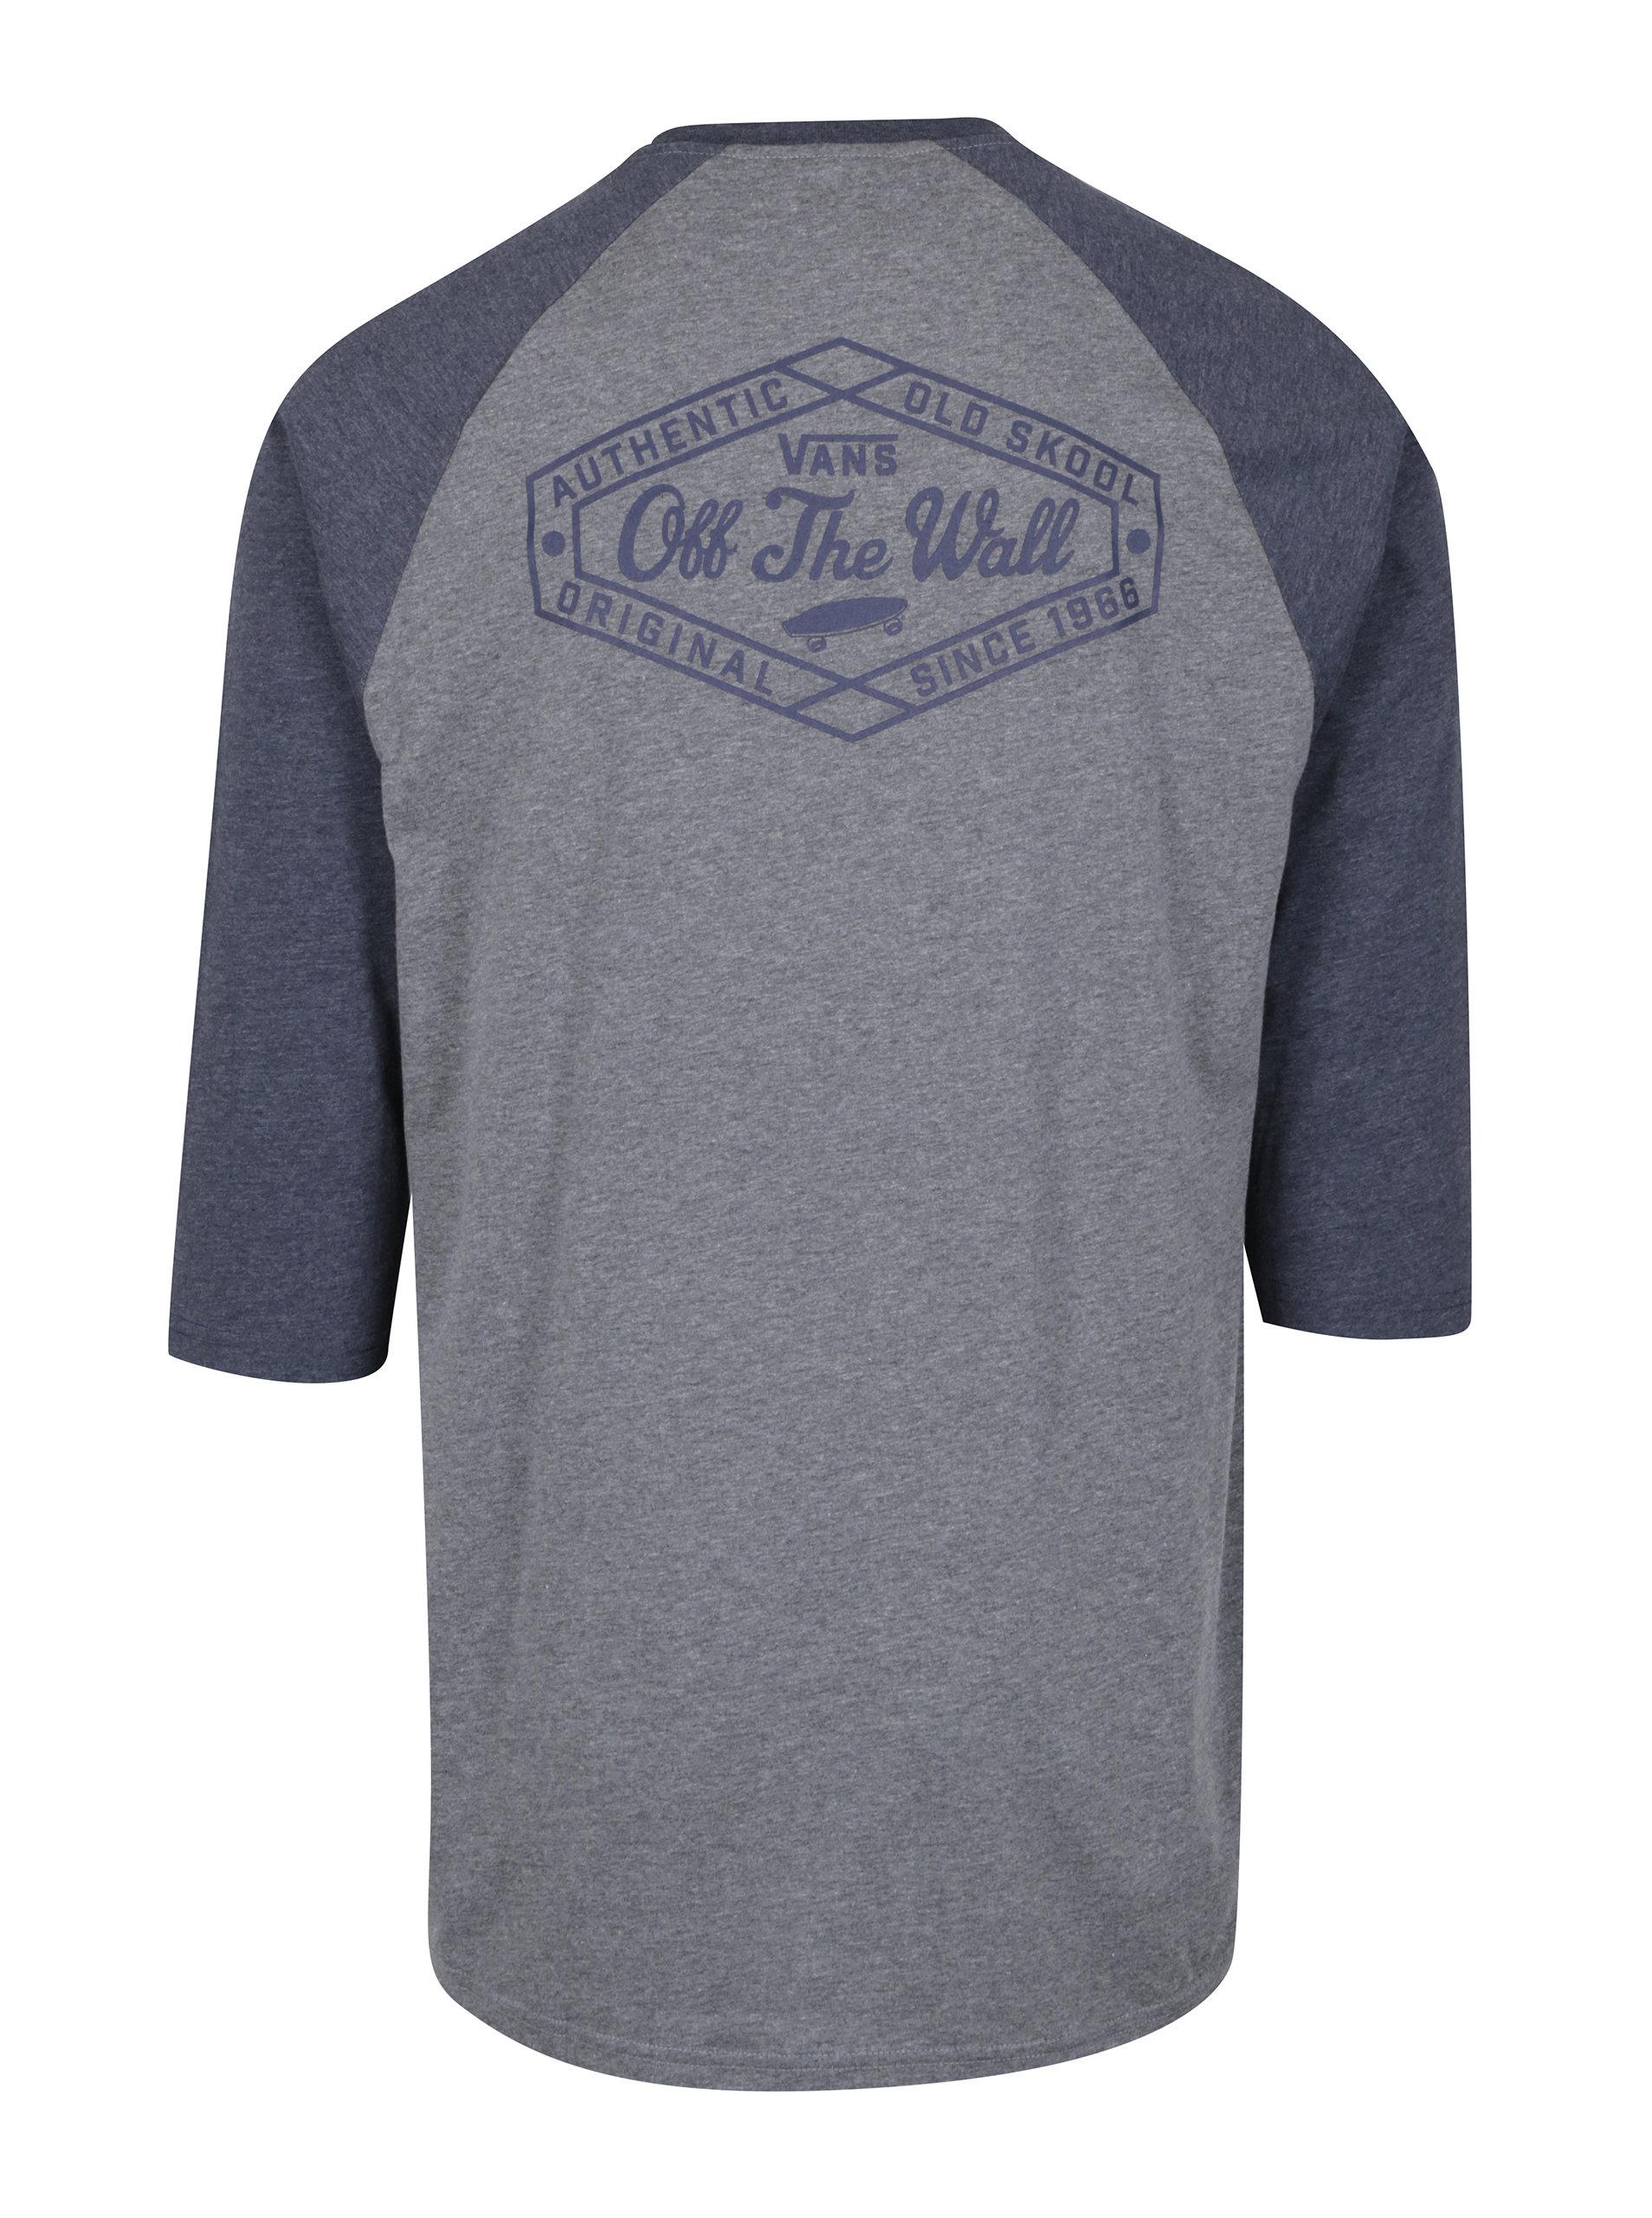 Šedé pánské custom fit tričko s potiskem na zádech VANS Original Lock ... 57ba4402ddb